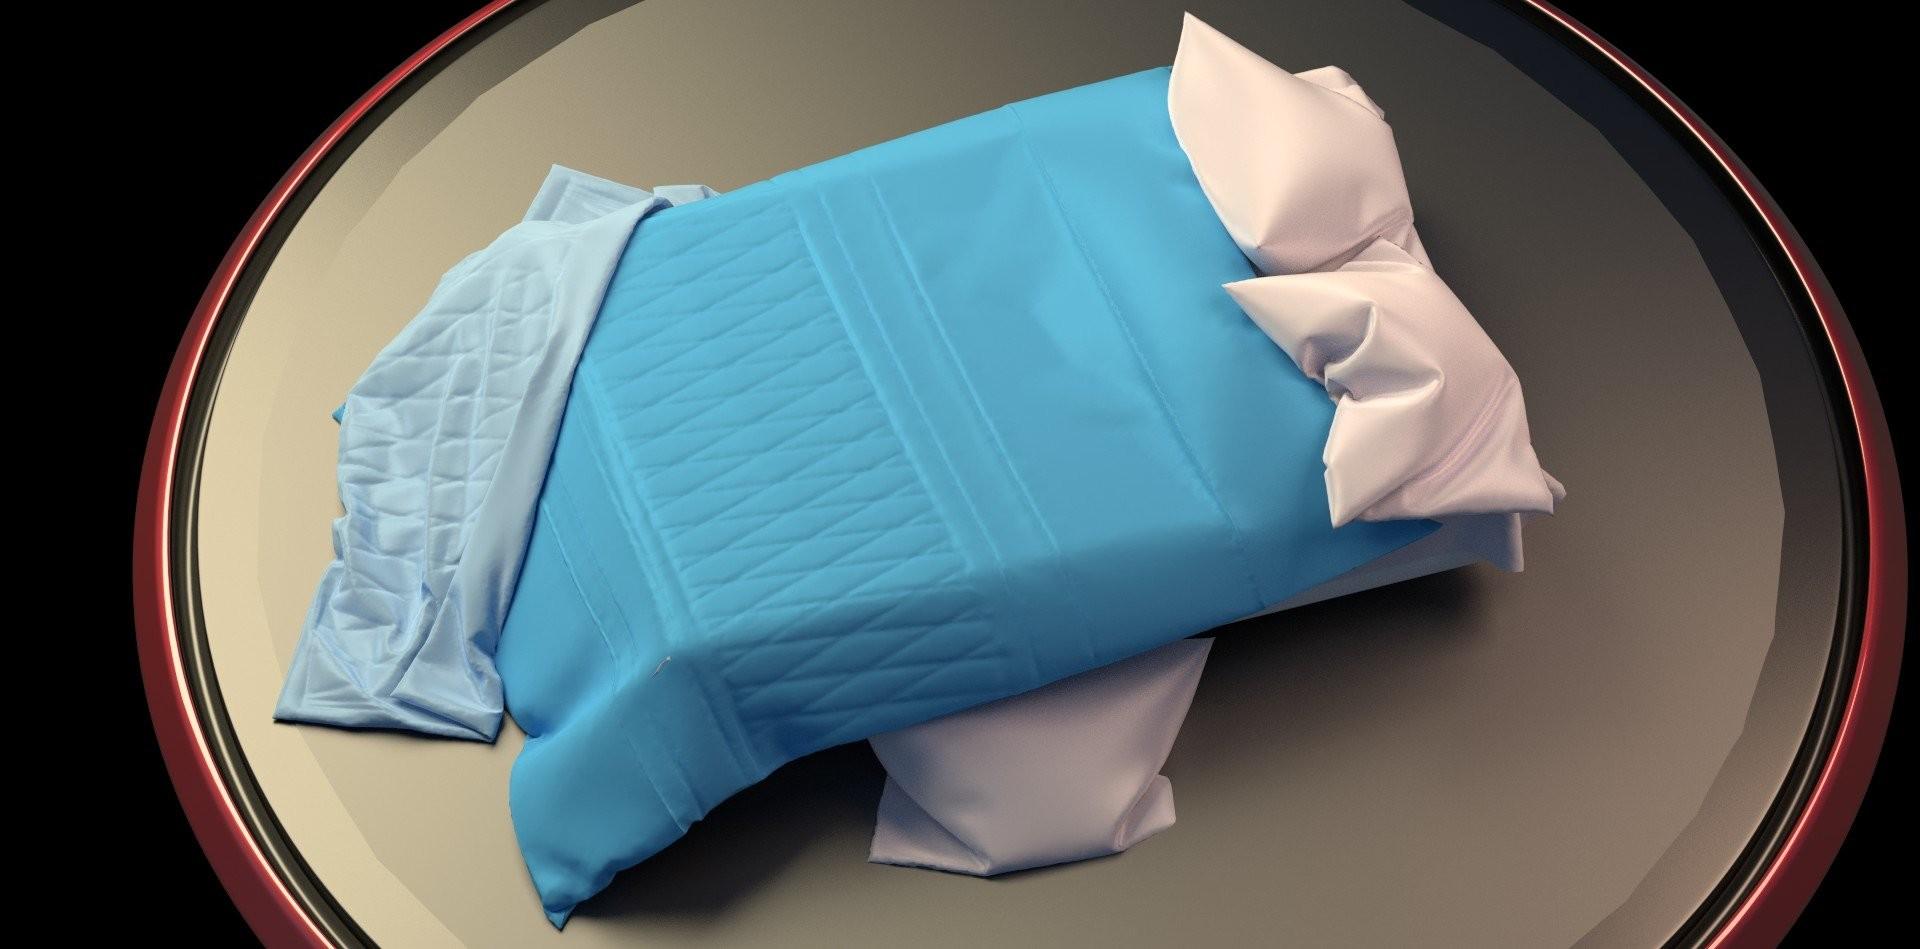 Jerry perkins mx1001 jerry perkins bedding2